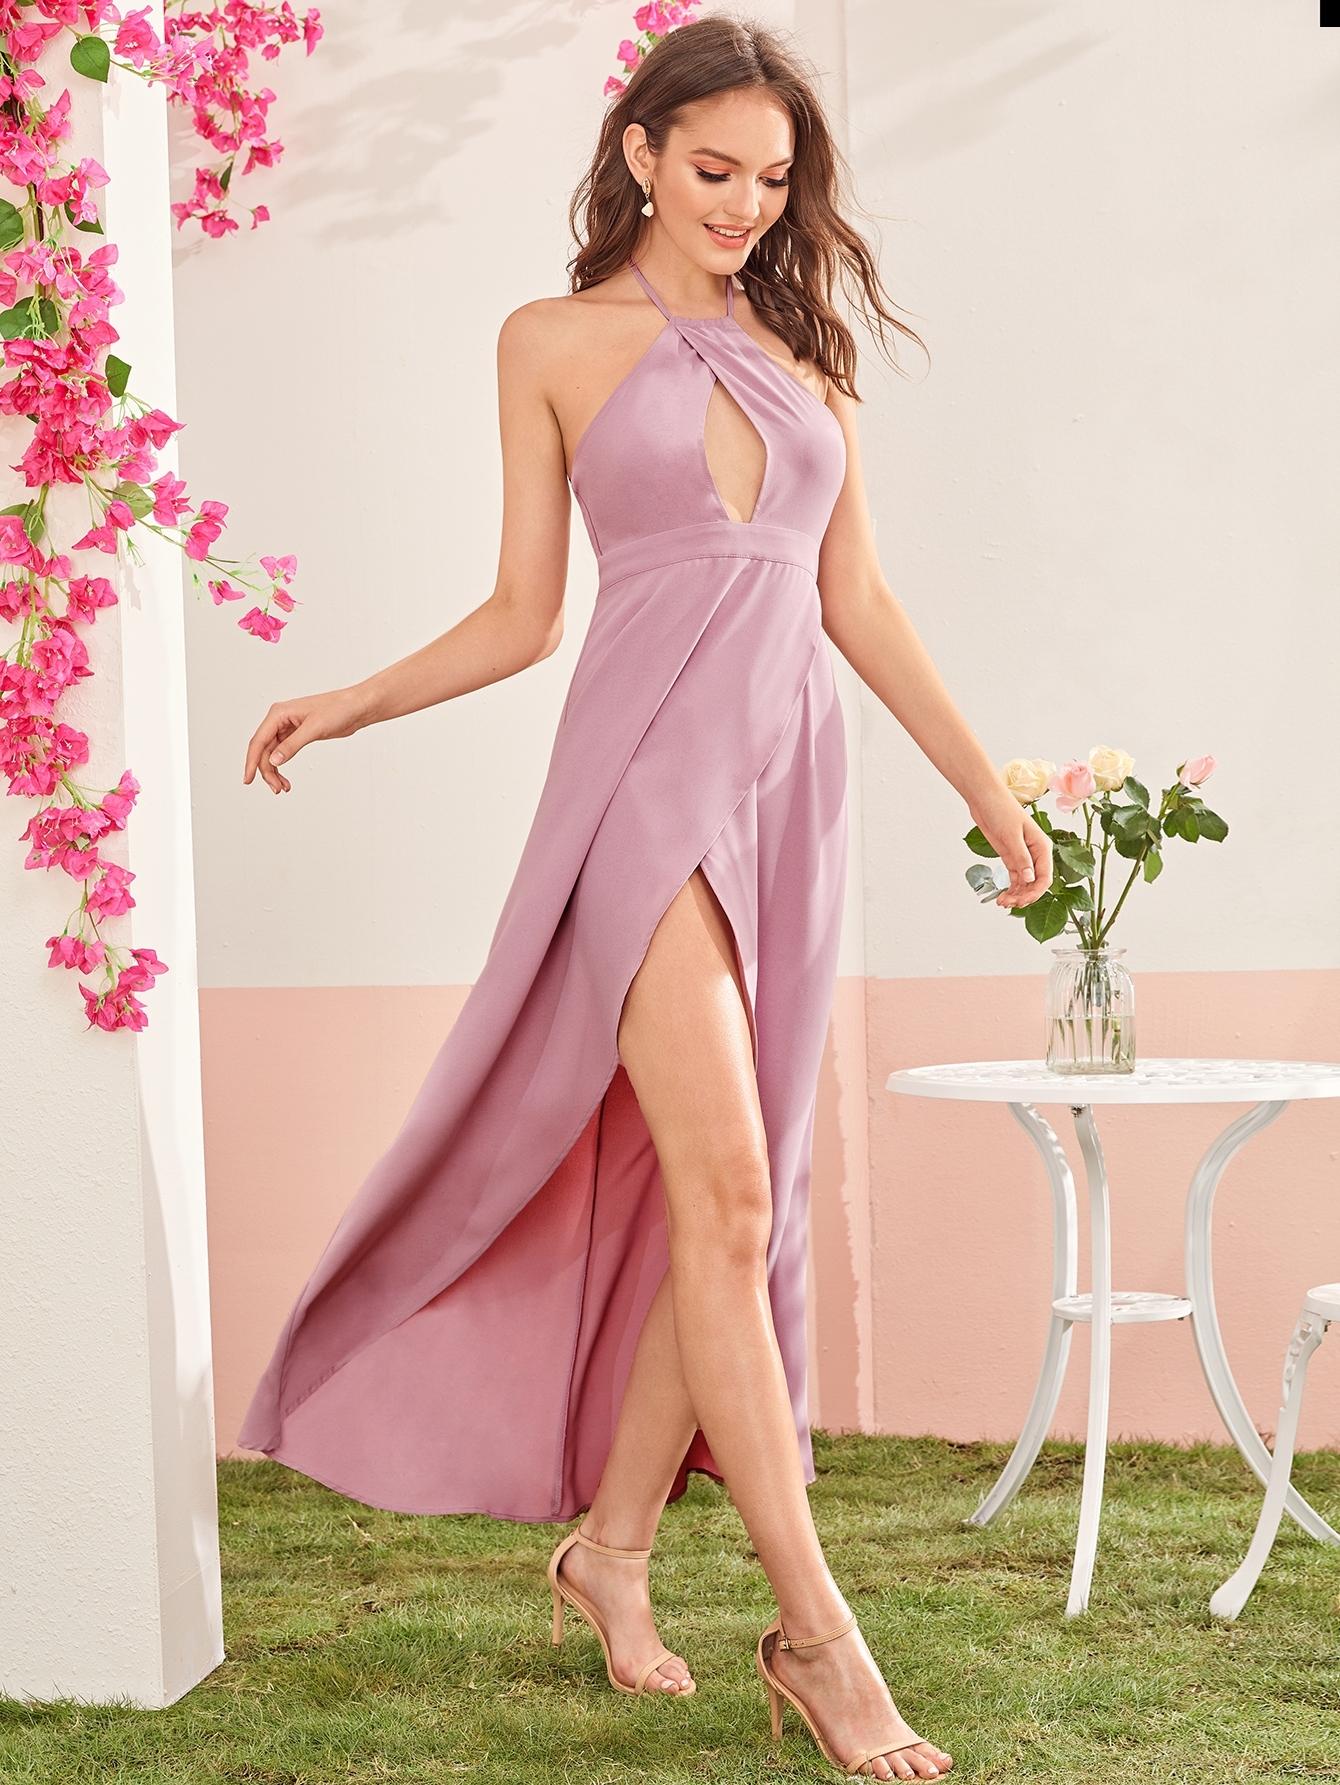 Фото - Асимметричное платье на запах с разрезом от SheIn цвет розовые